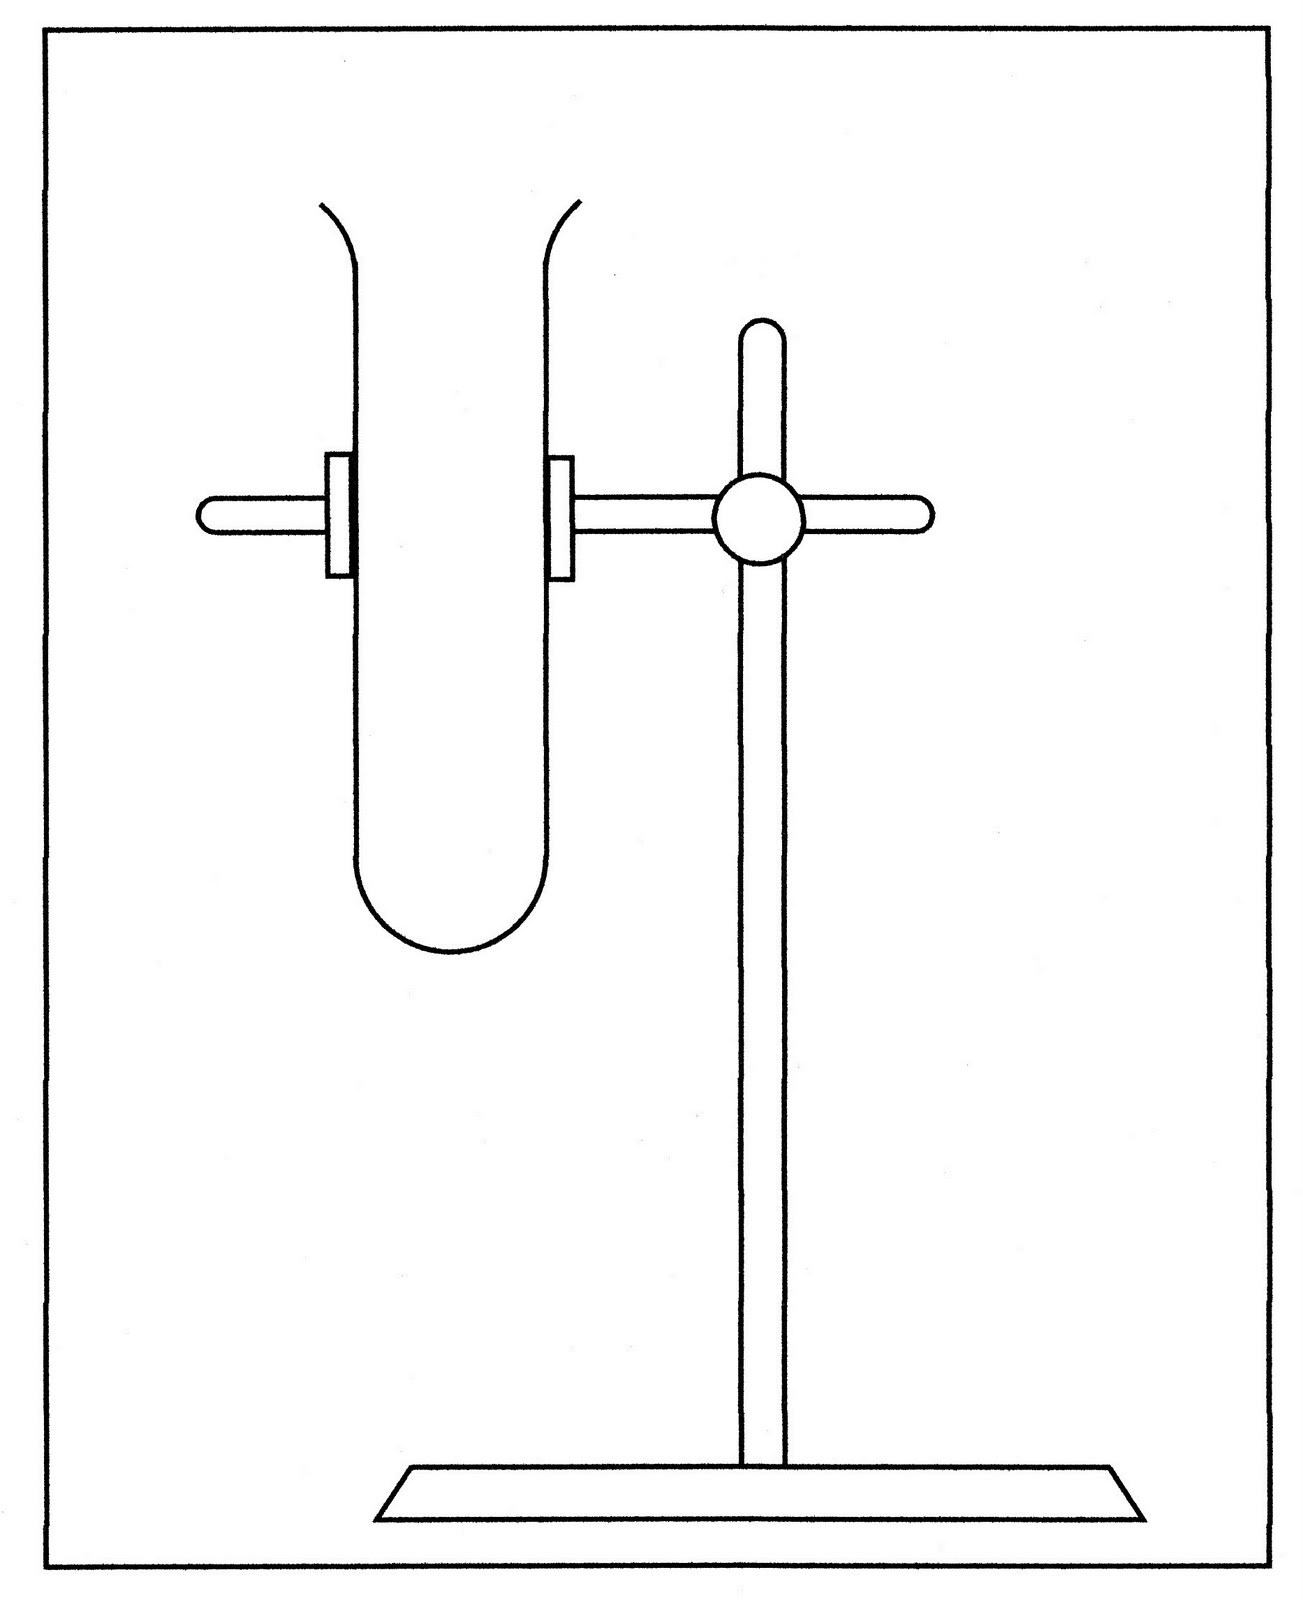 retort stand and clamp diagram kohler mand racing parts test tube holder